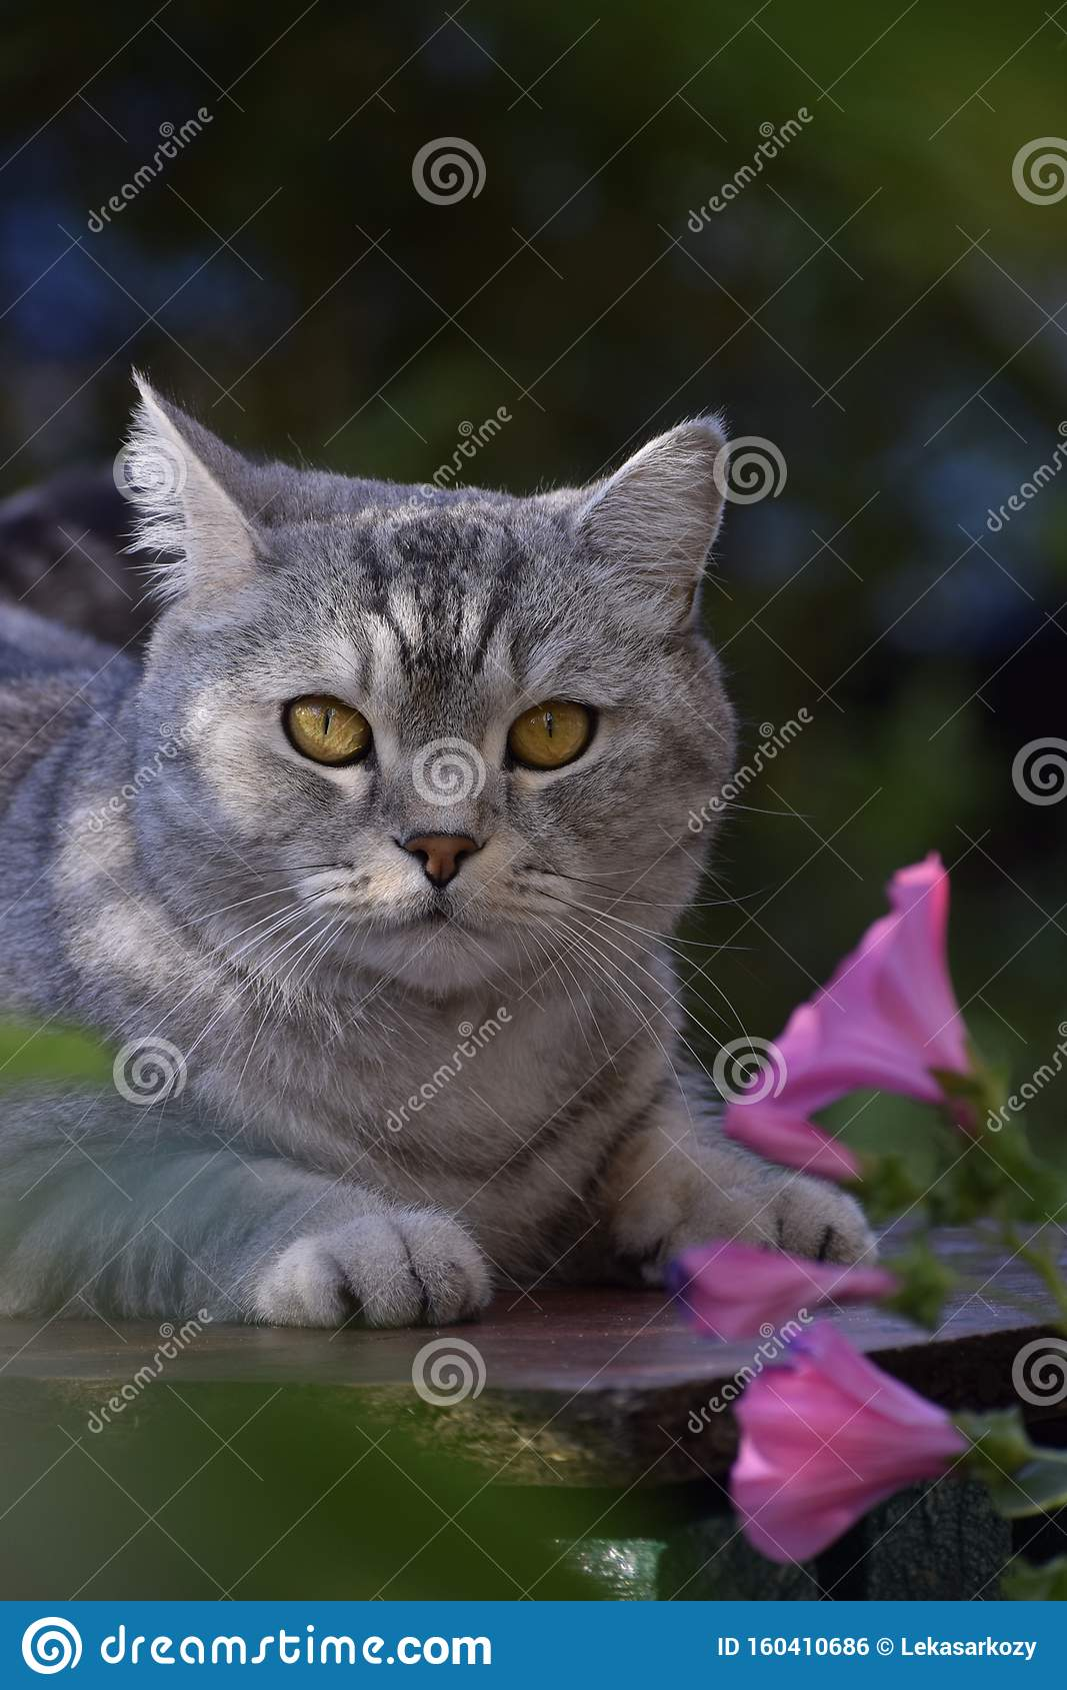 Grey Cat Pink Flowers Cute Beautiful Eyes Kitty Stock Photo Image Of Splash Beautiful 160410686